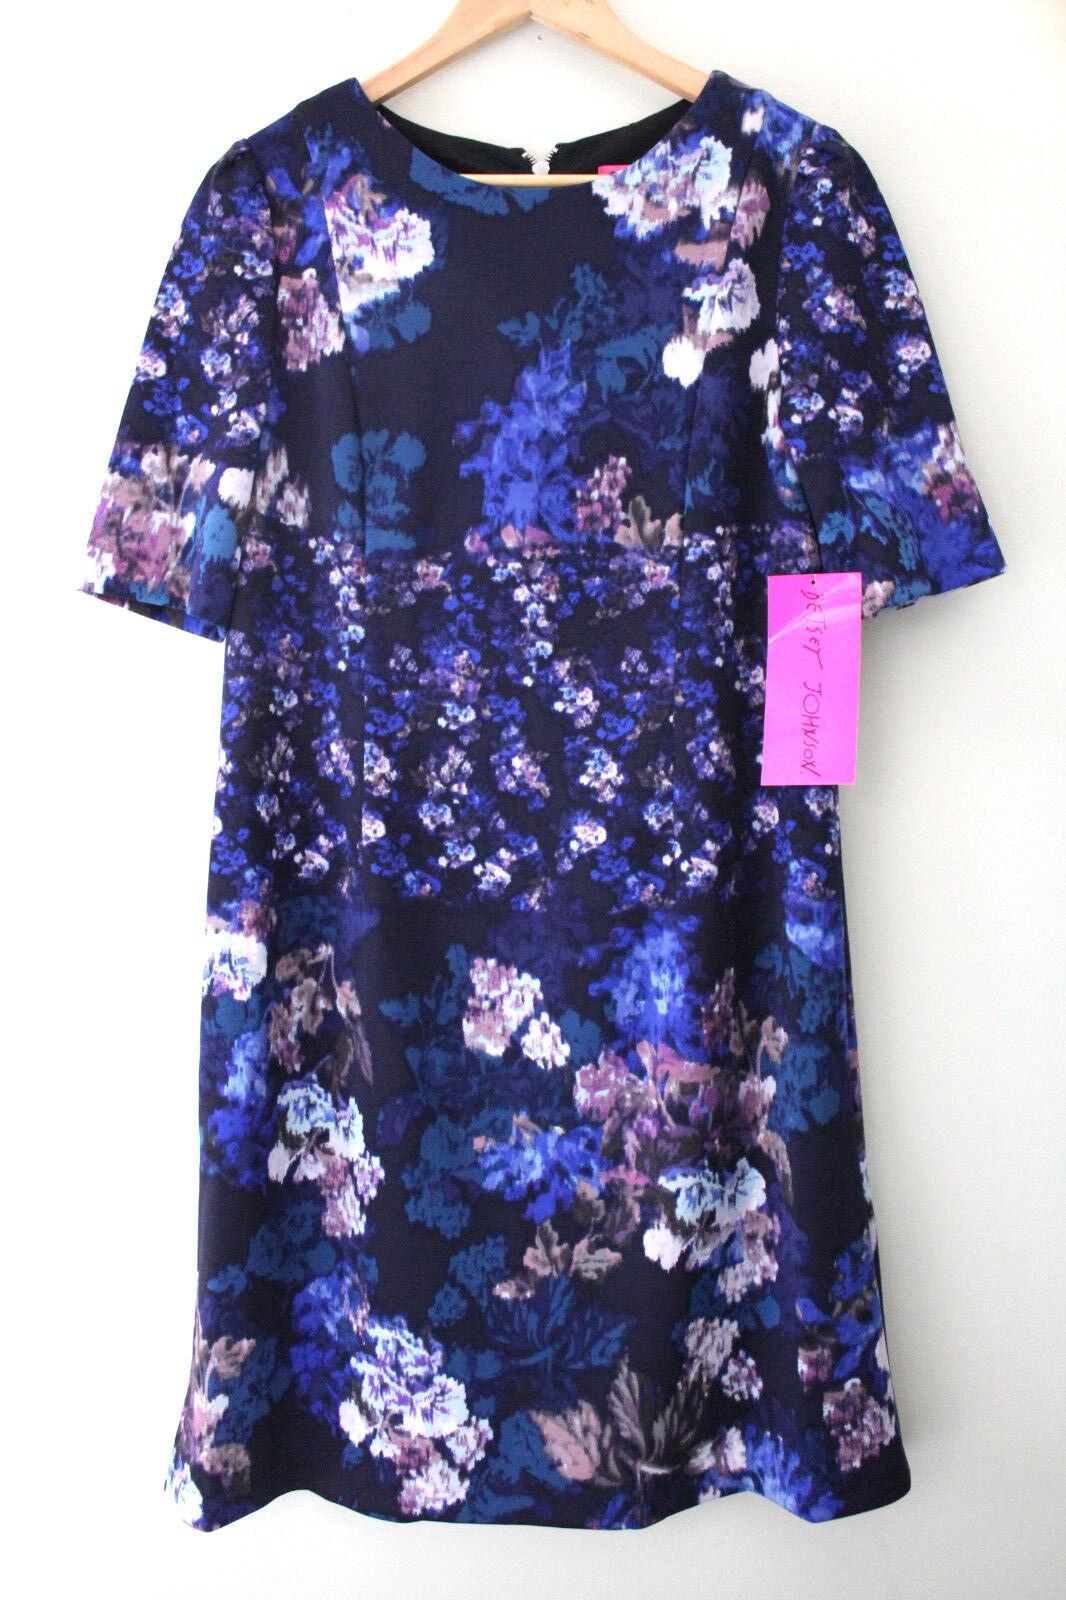 NWT Betsey Johnson Gorgeous schwarz Blau Floral Short Sleeve Shift Dress 10